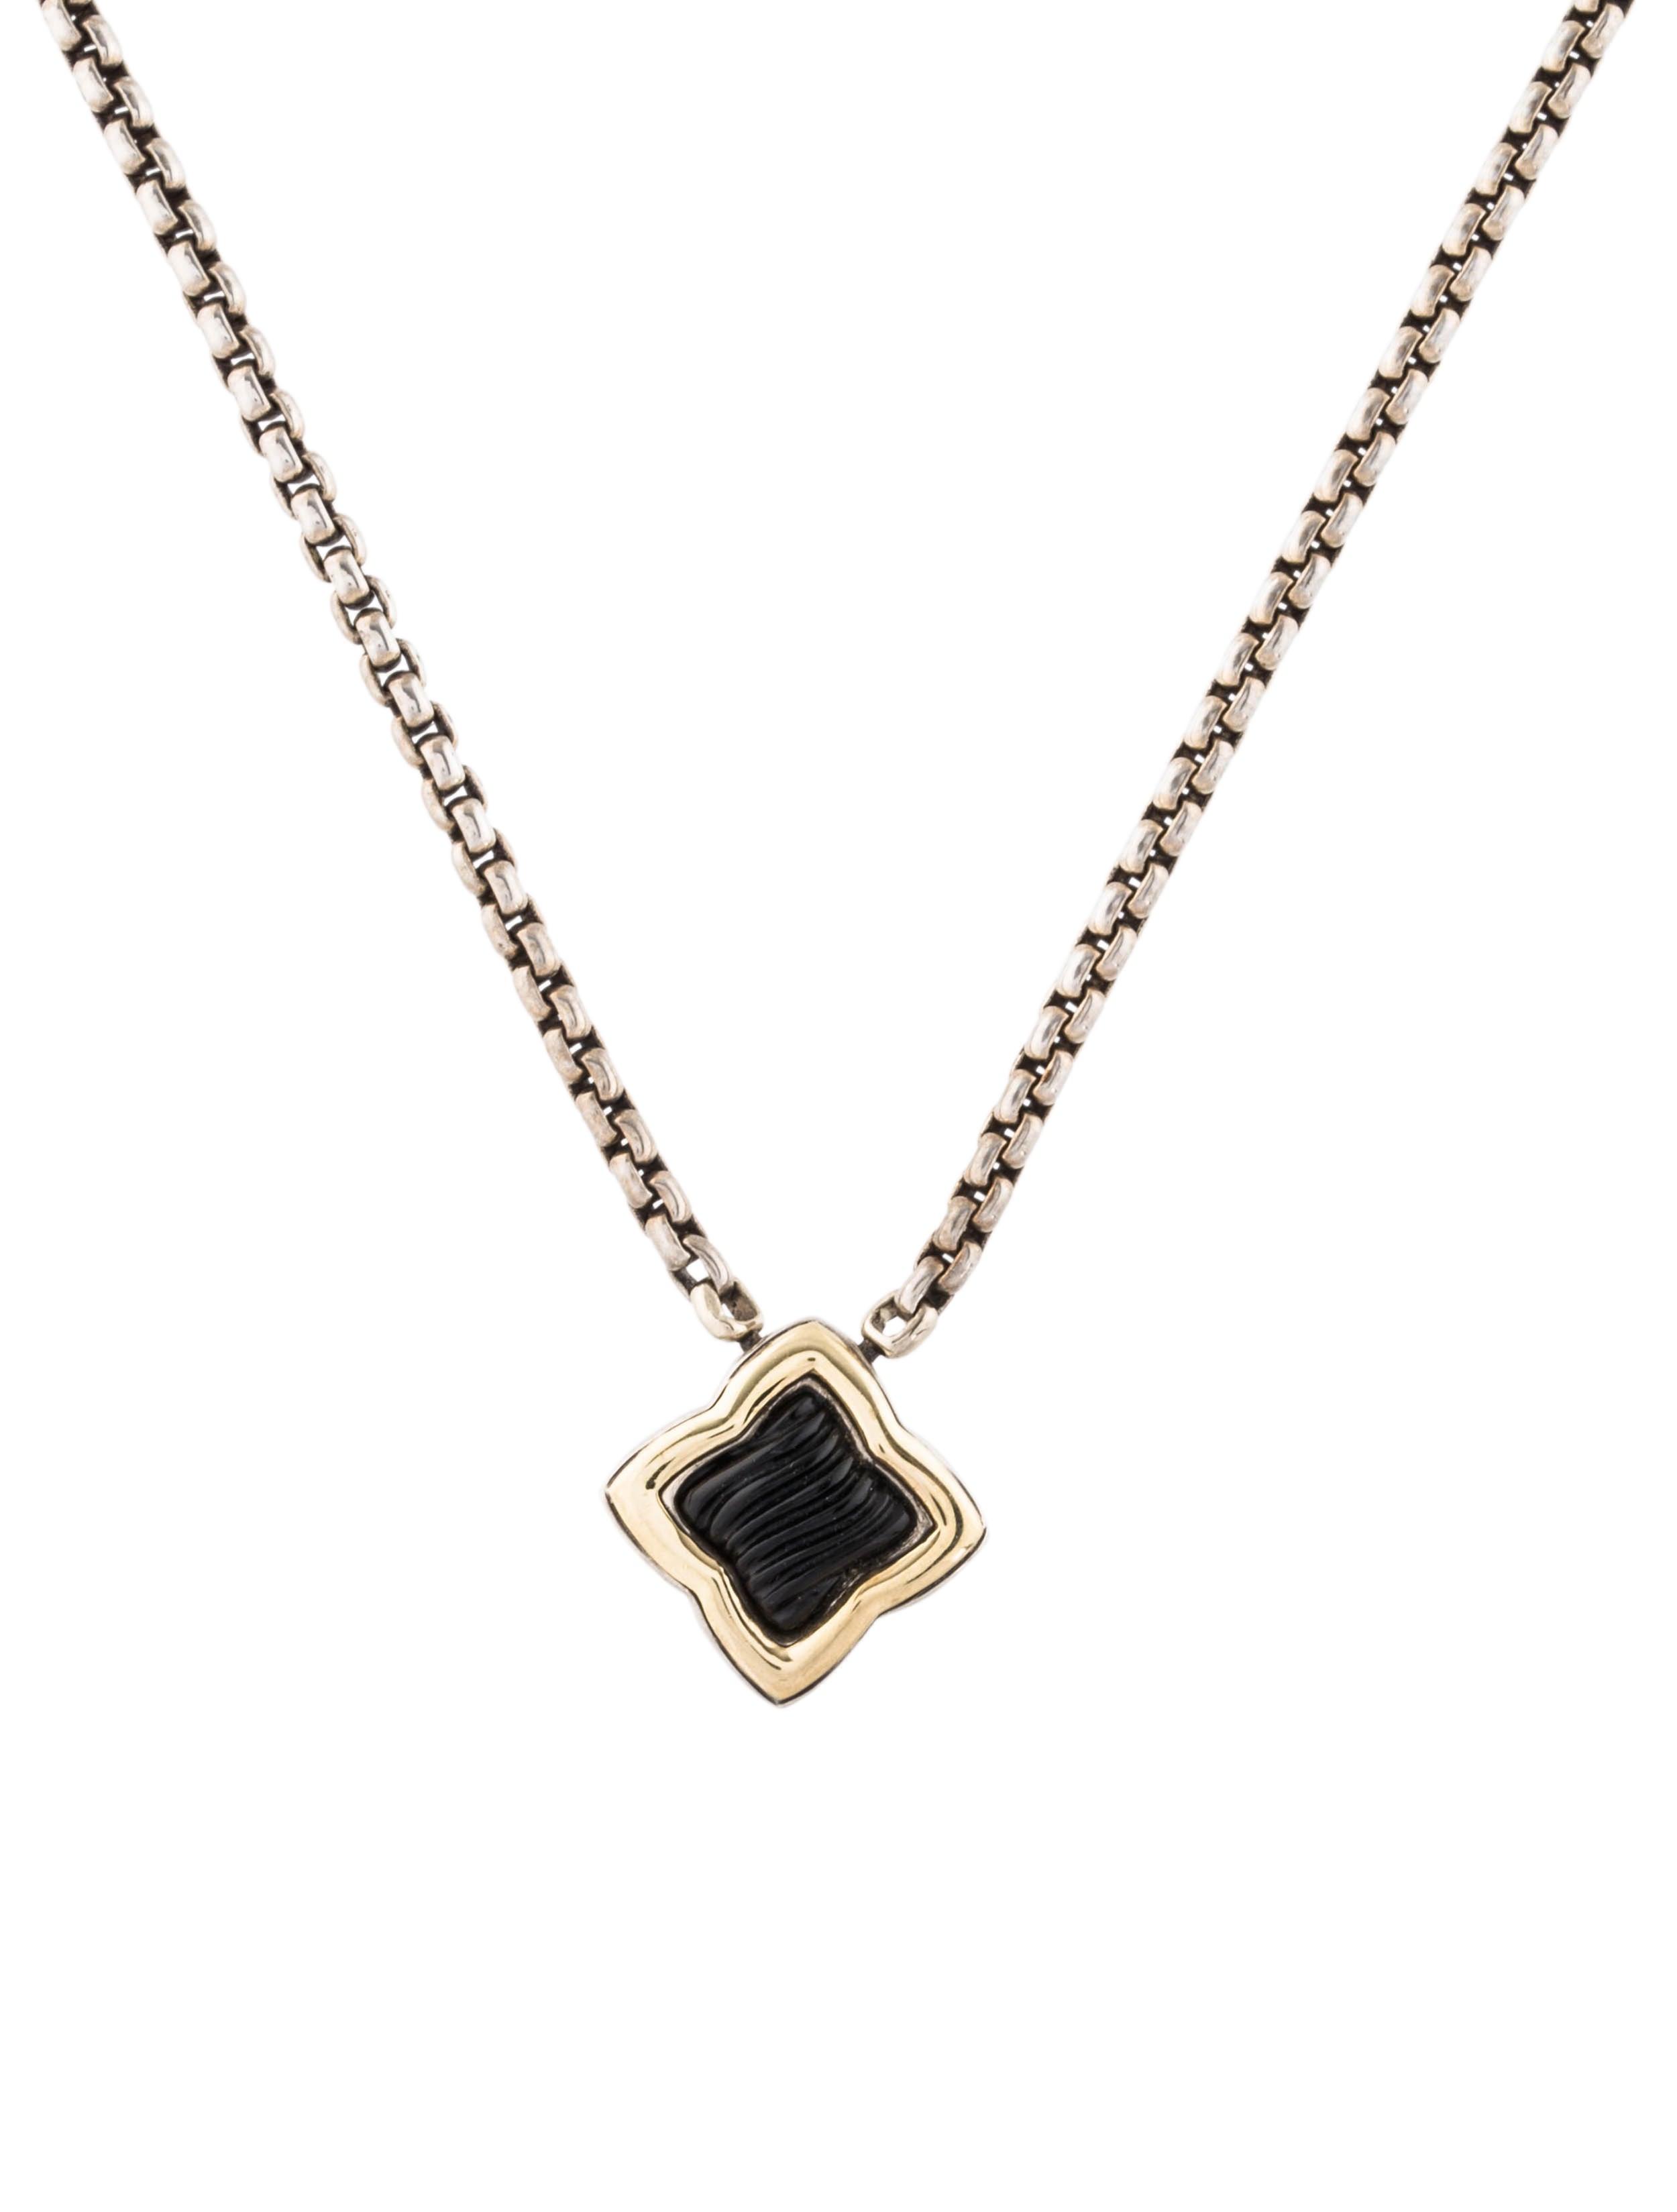 David yurman onyx quatrefoil pendant necklace necklaces dvy51728 onyx quatrefoil pendant necklace aloadofball Choice Image